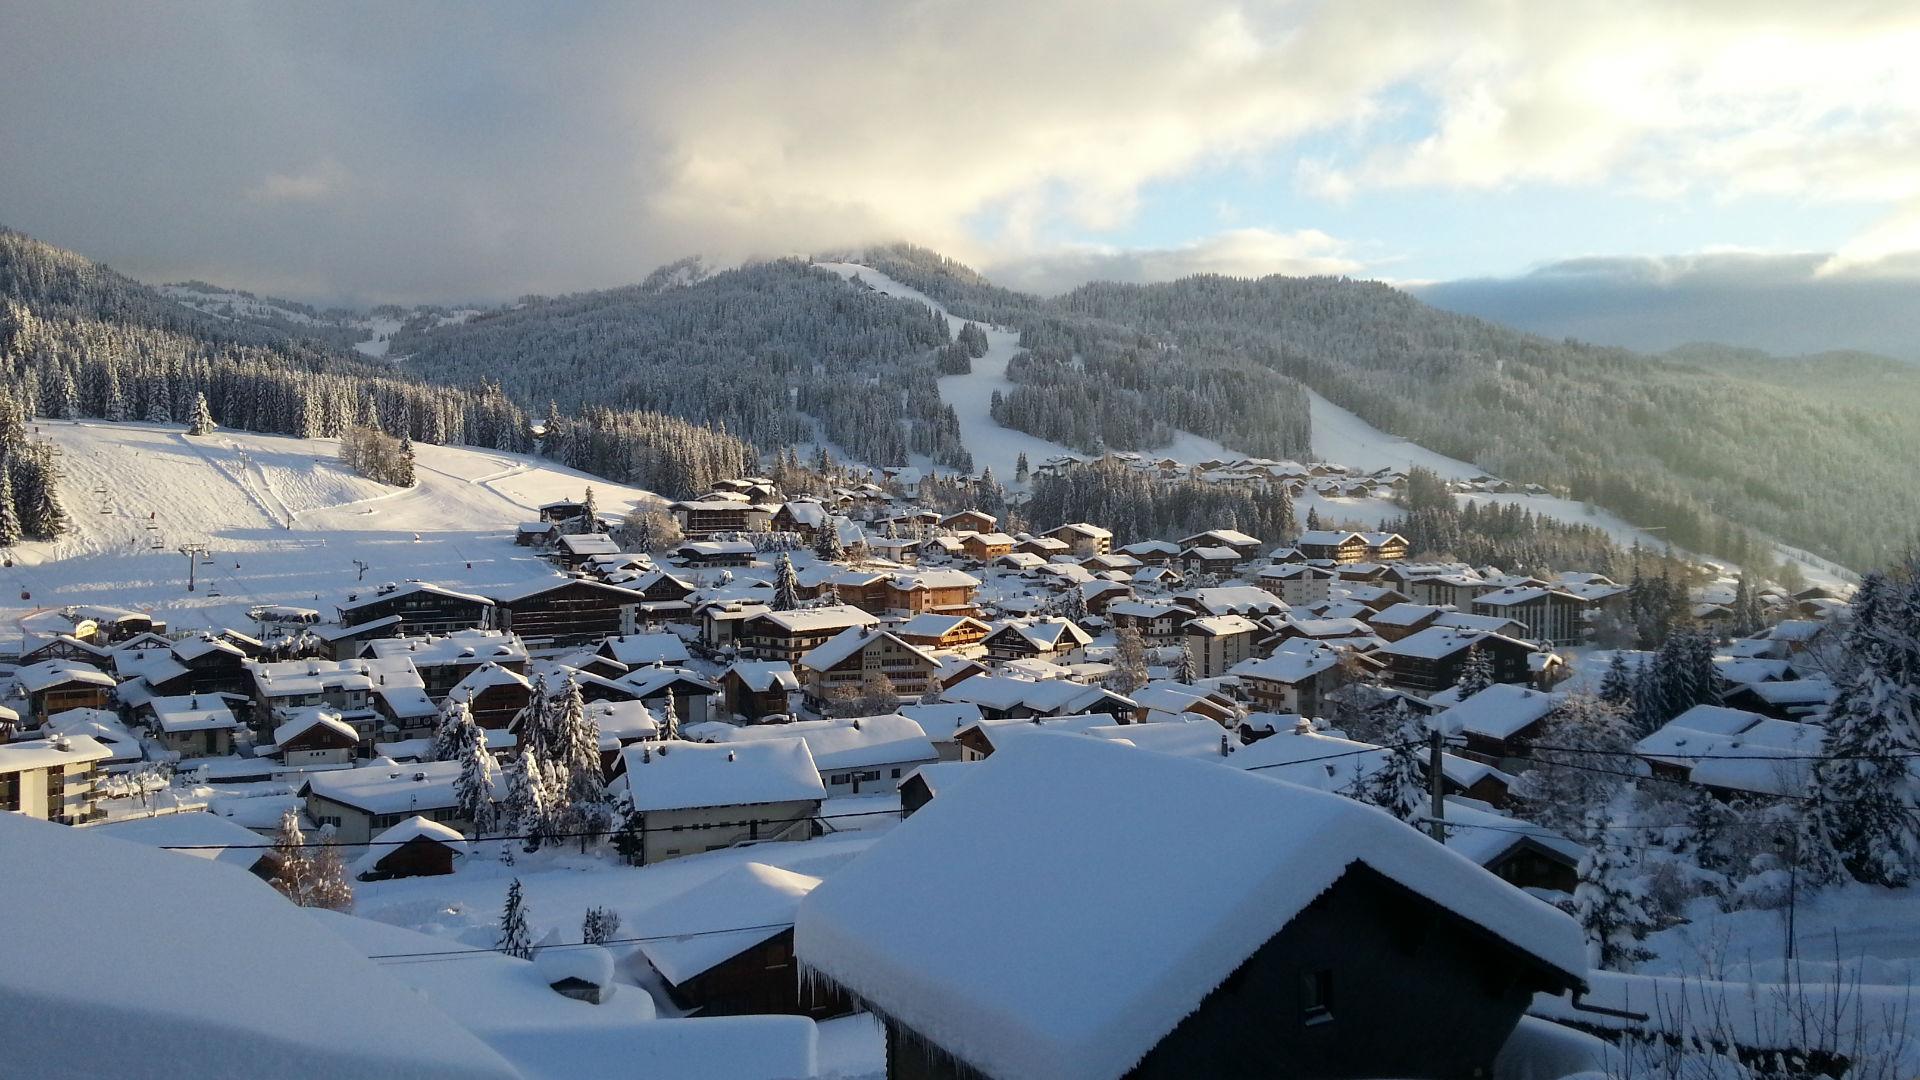 Les Gets Ski Slopes, Sunset